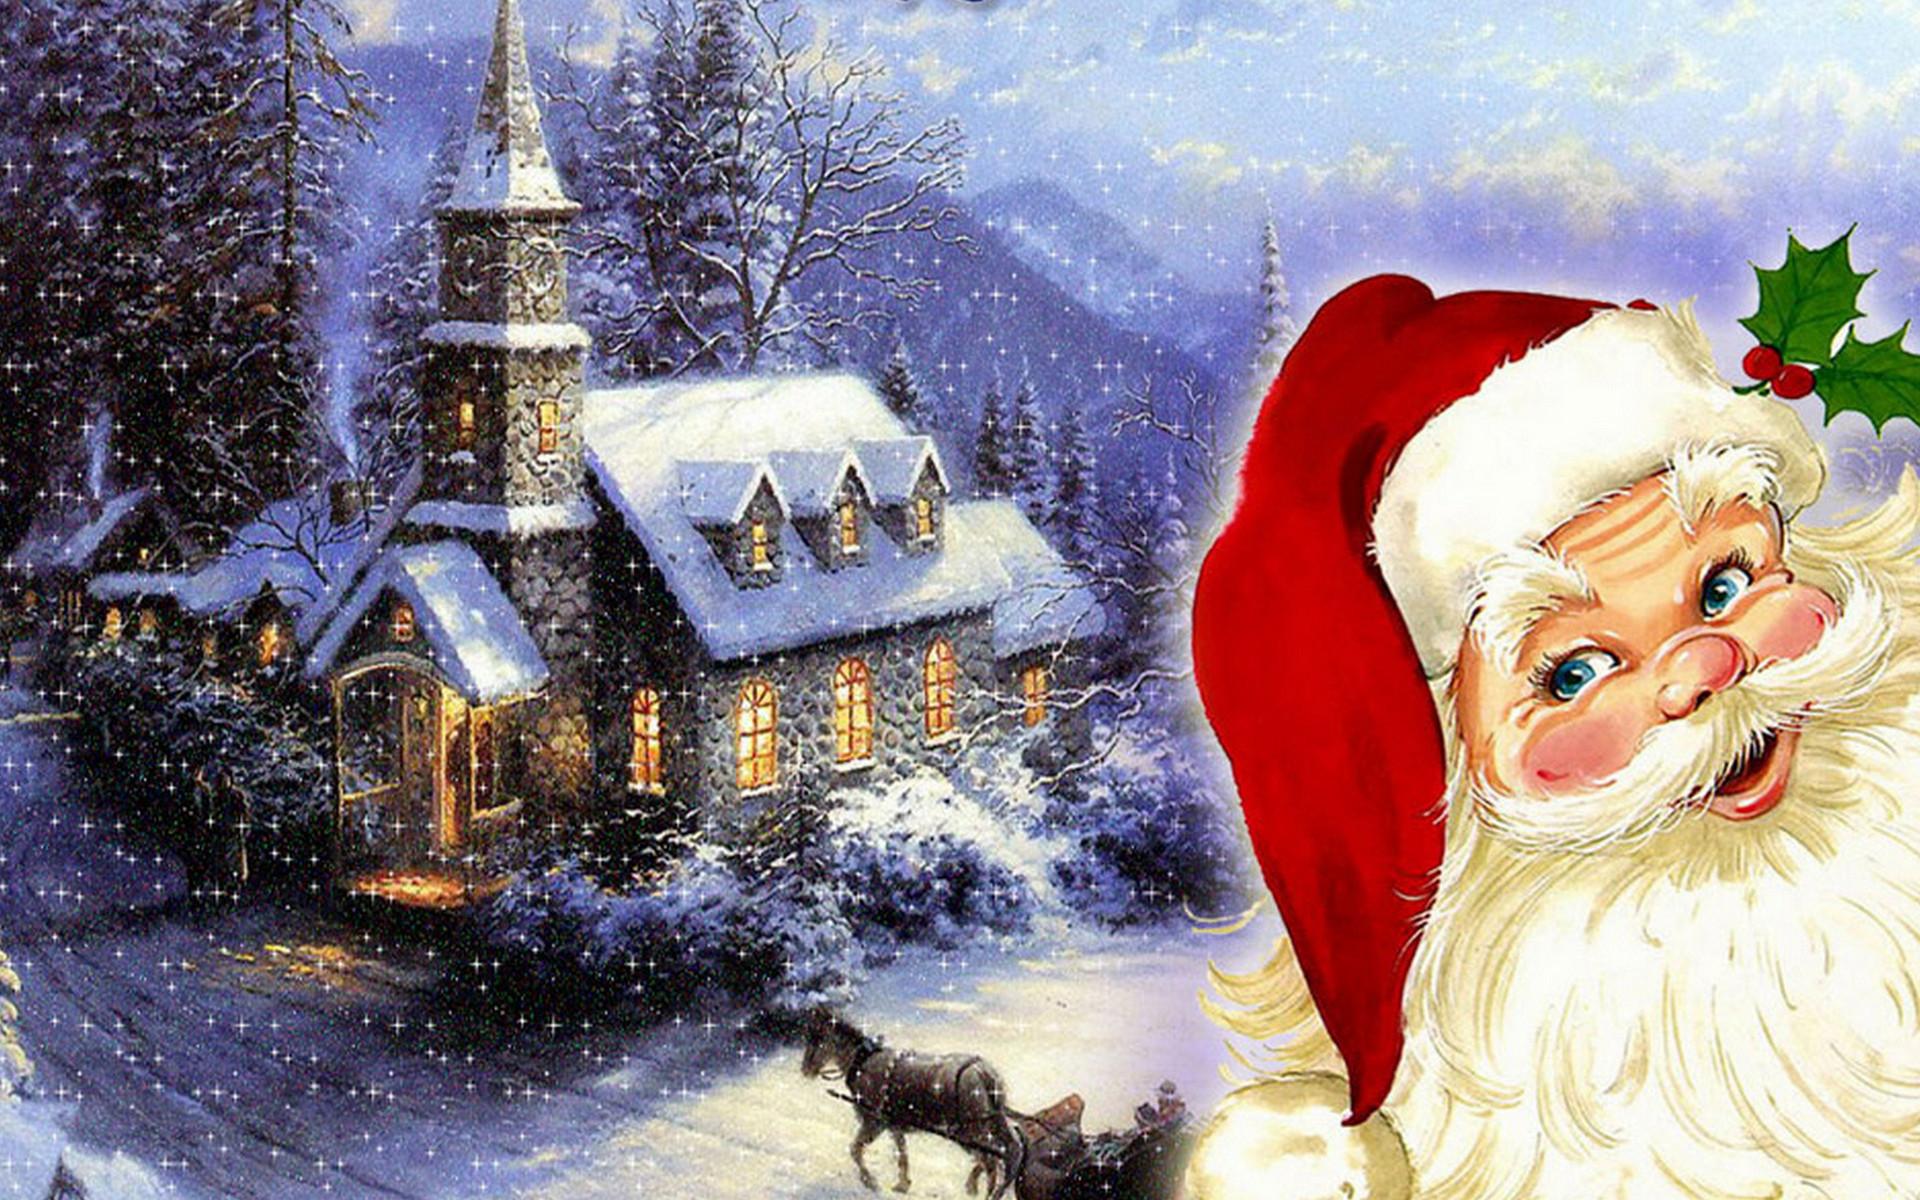 Santa desktop wallpaper 1920x1200 merry christmas santa claus hd wallpaper wallpaper download 18 voltagebd Choice Image